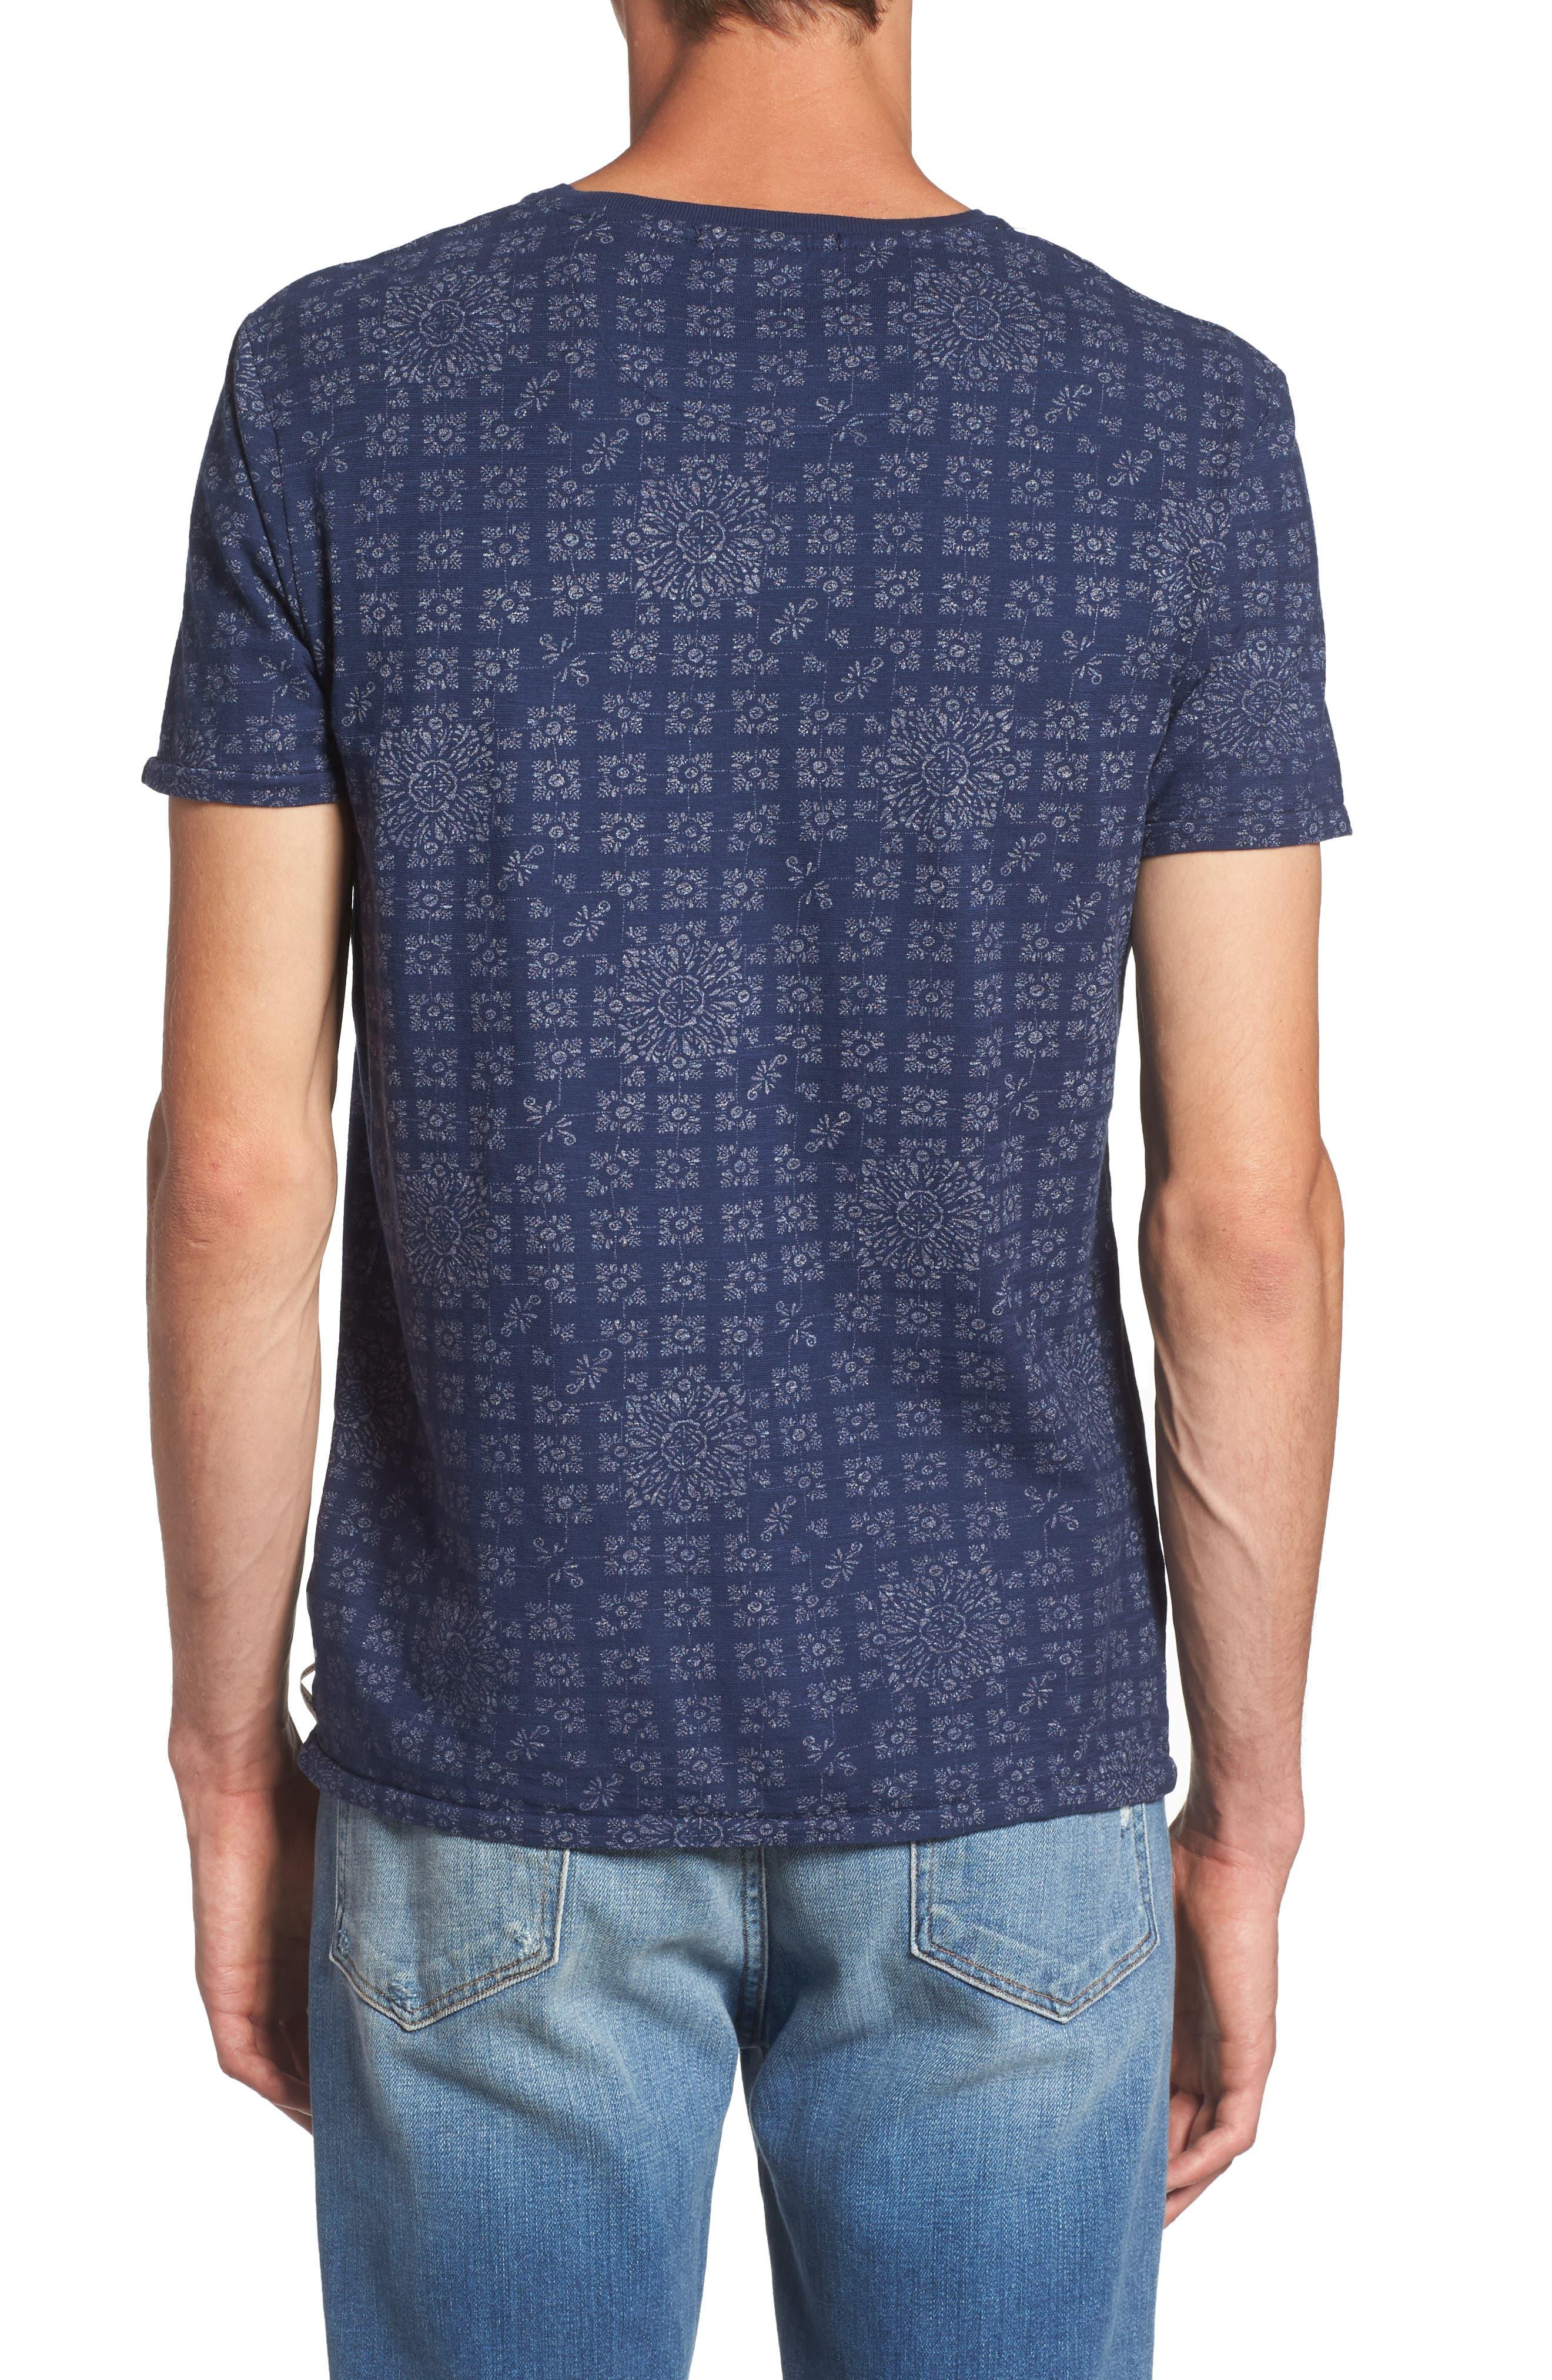 AMS Graphic T-Shirt,                             Alternate thumbnail 2, color,                             Combo D